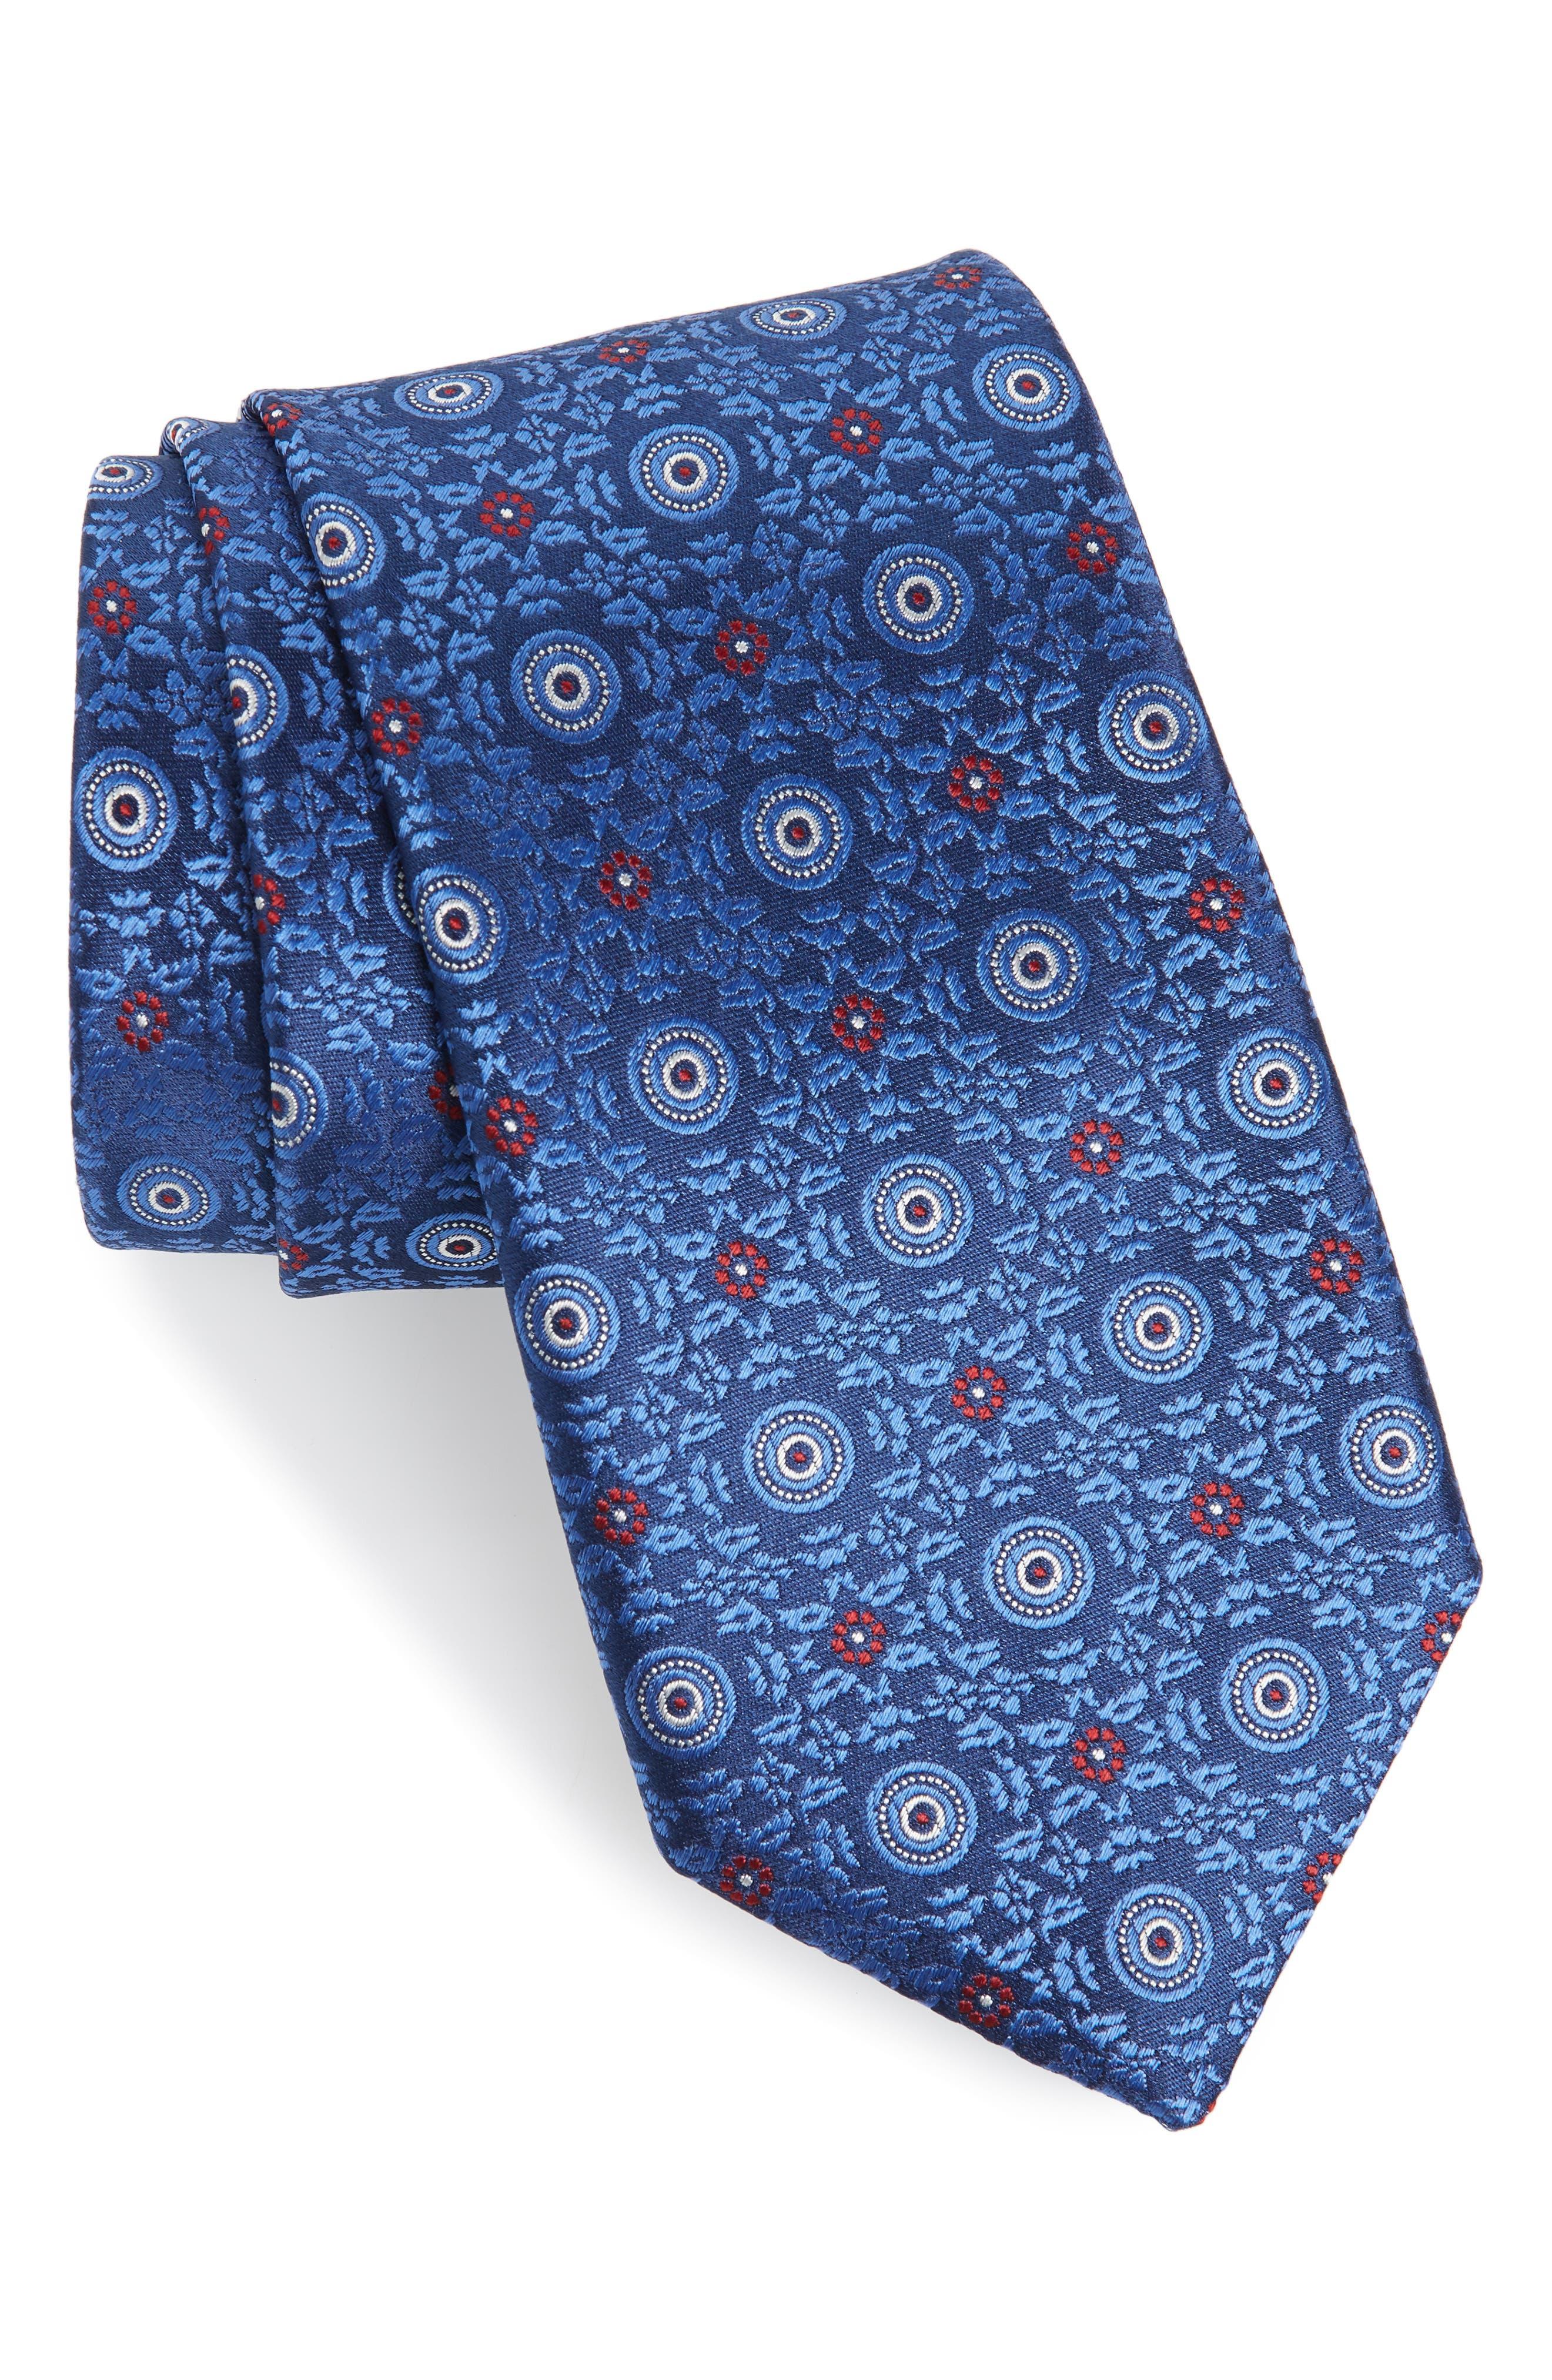 CANALI Medallion Silk X-Long Tie, Main, color, BLUE